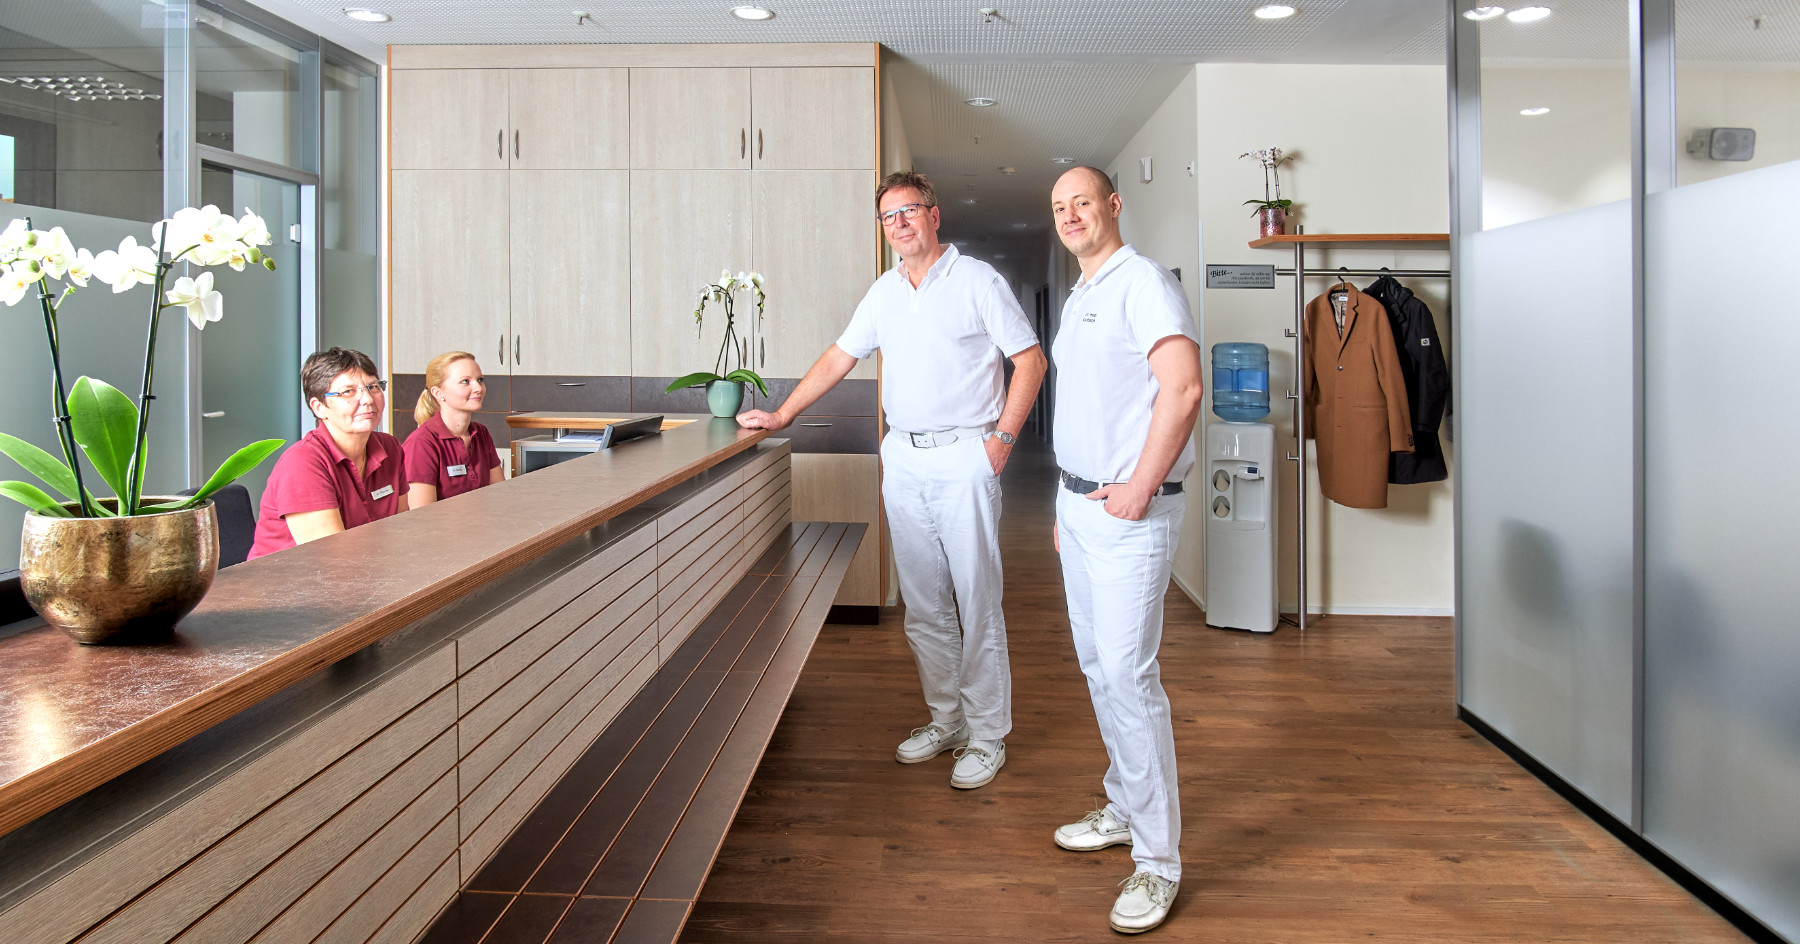 Orthopäden Neuer Mohnhof Empfang